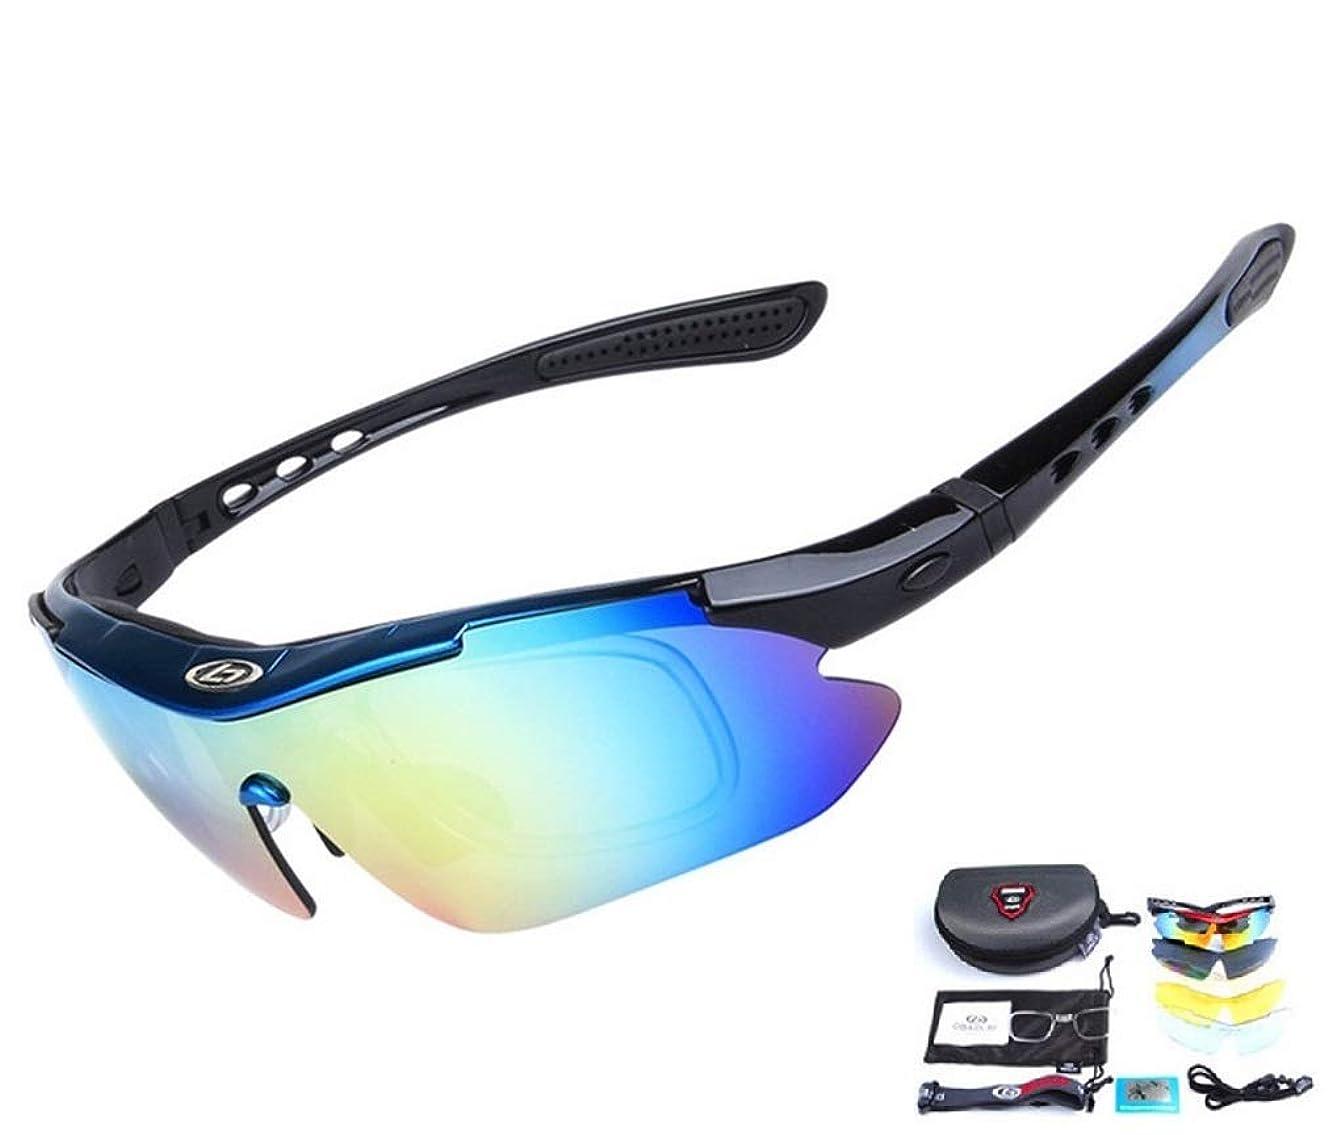 Runspeed Polarized Sports Sunglasses UV400 with 5 Interchangeable Lenes for Men Women Cycling Running Driving Fishing Golf Baseball Glasses